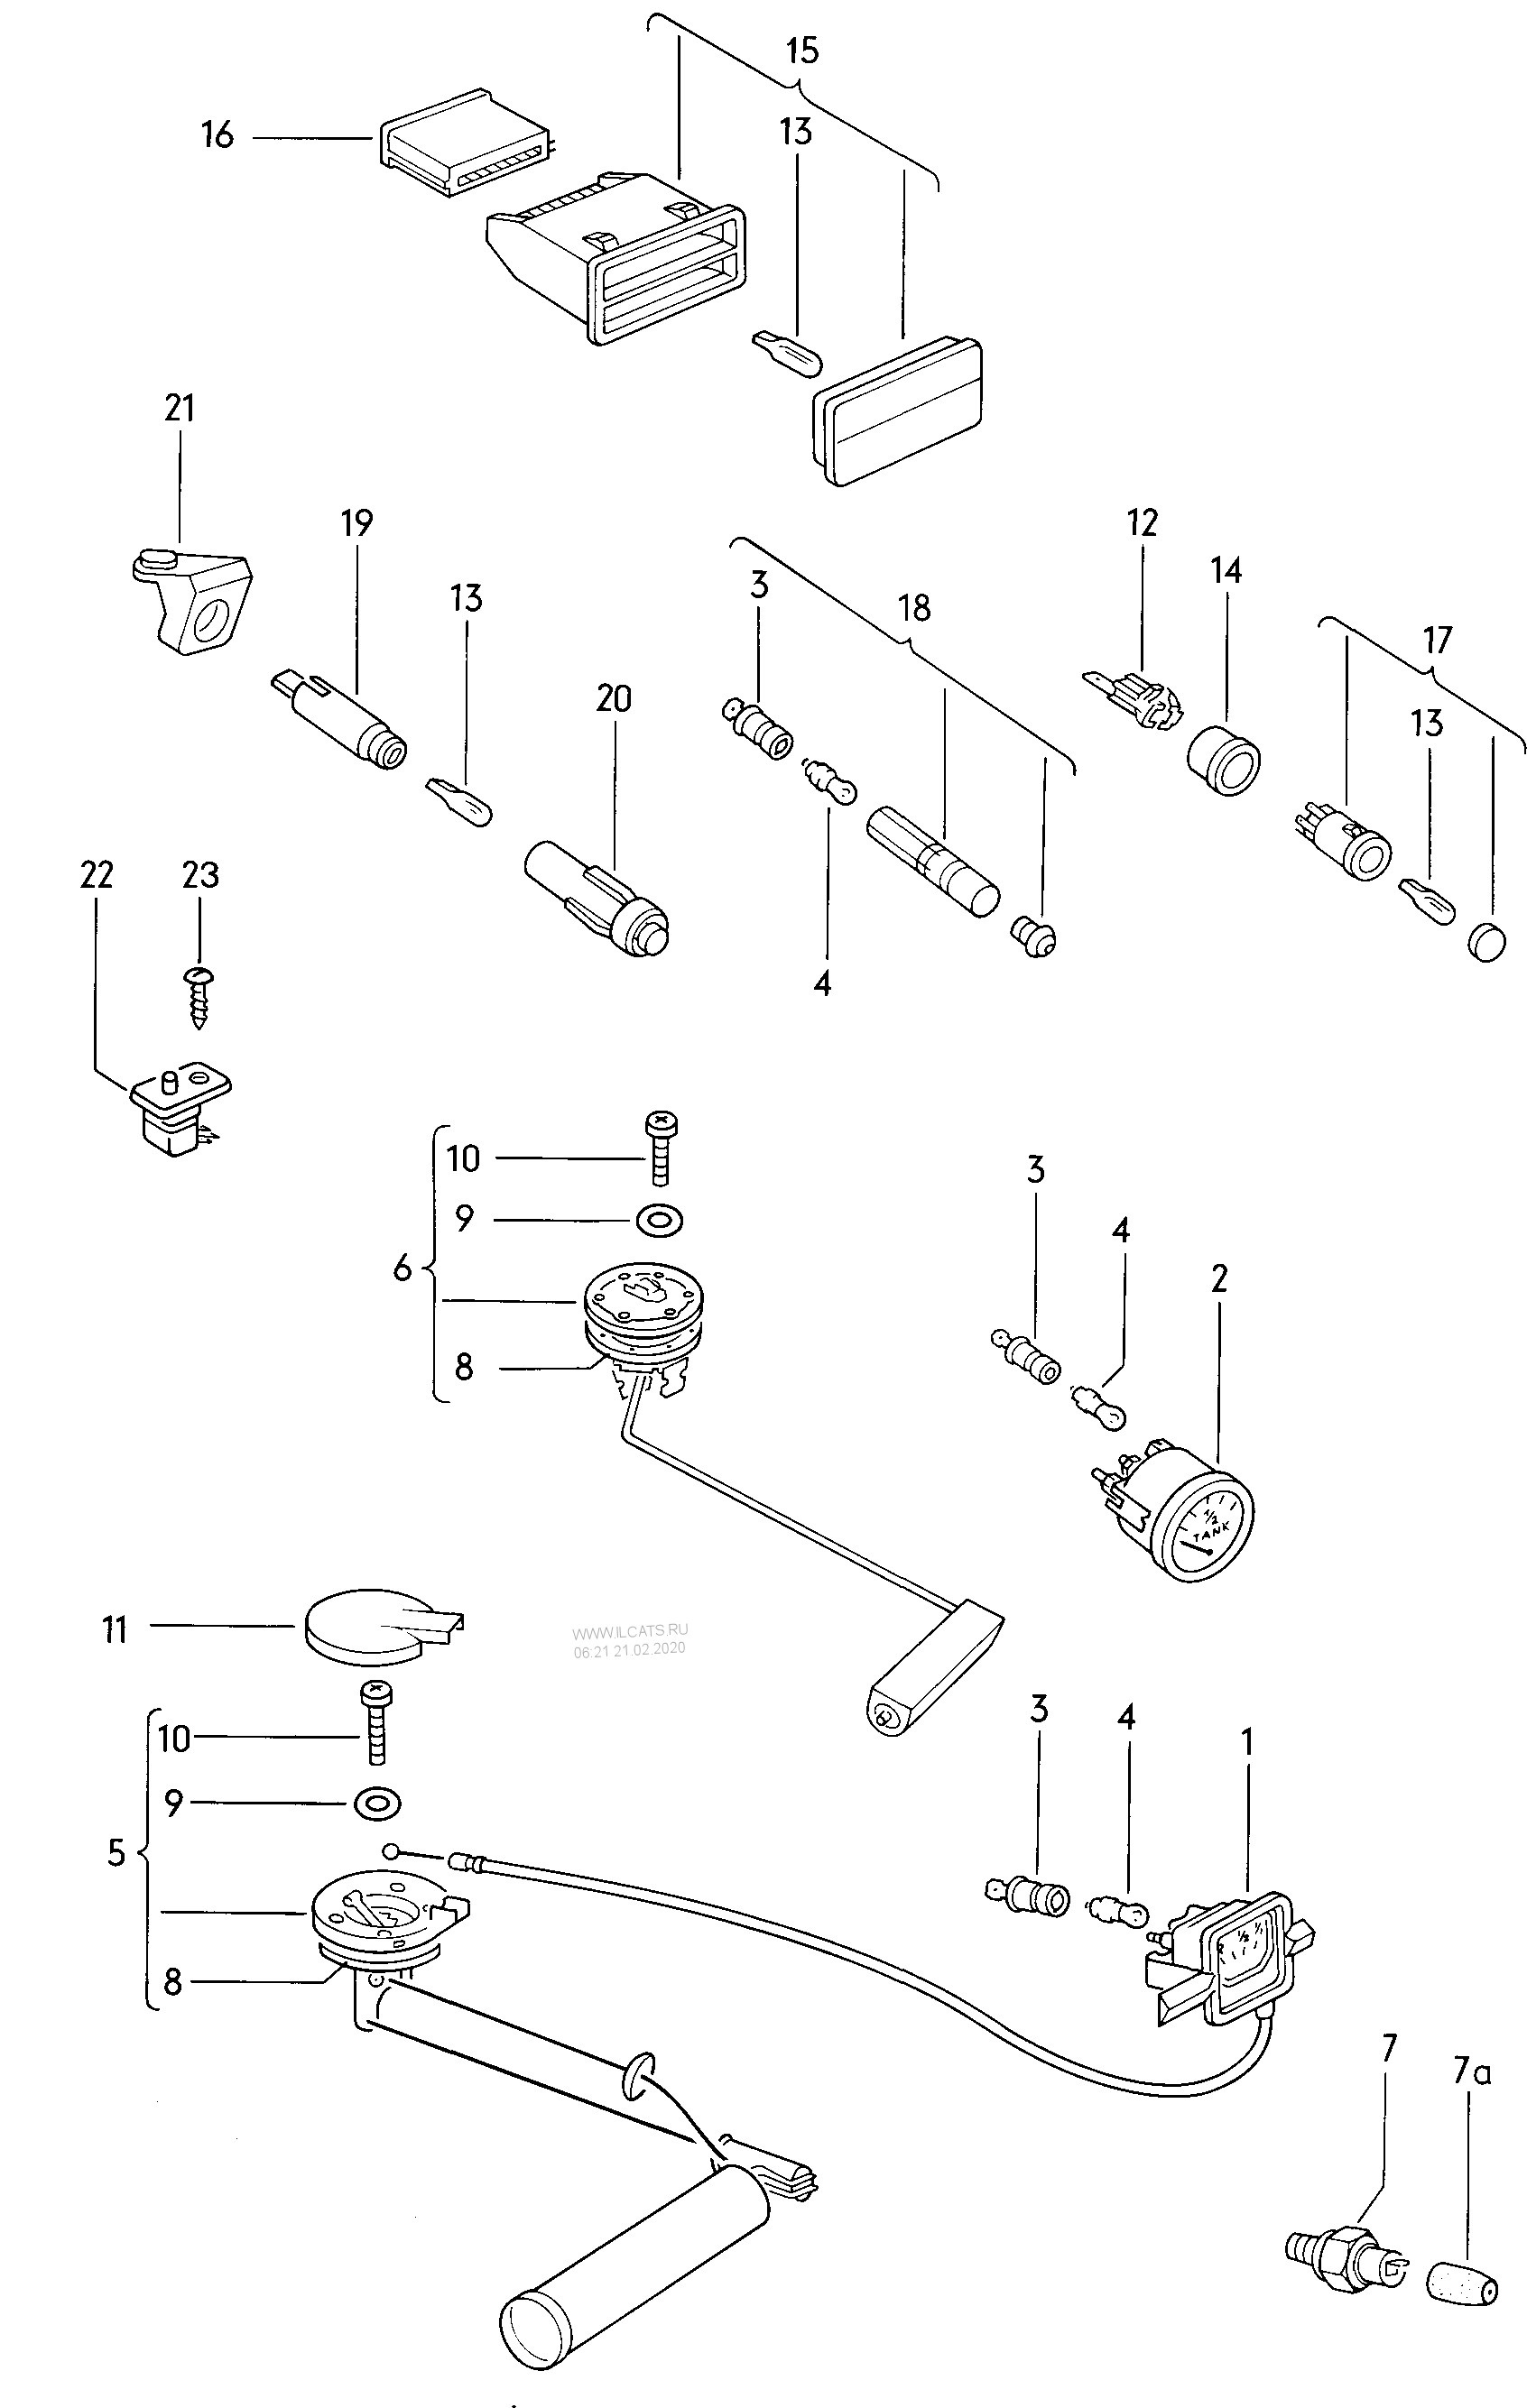 Oil Pressure Gauge Connection Diagram